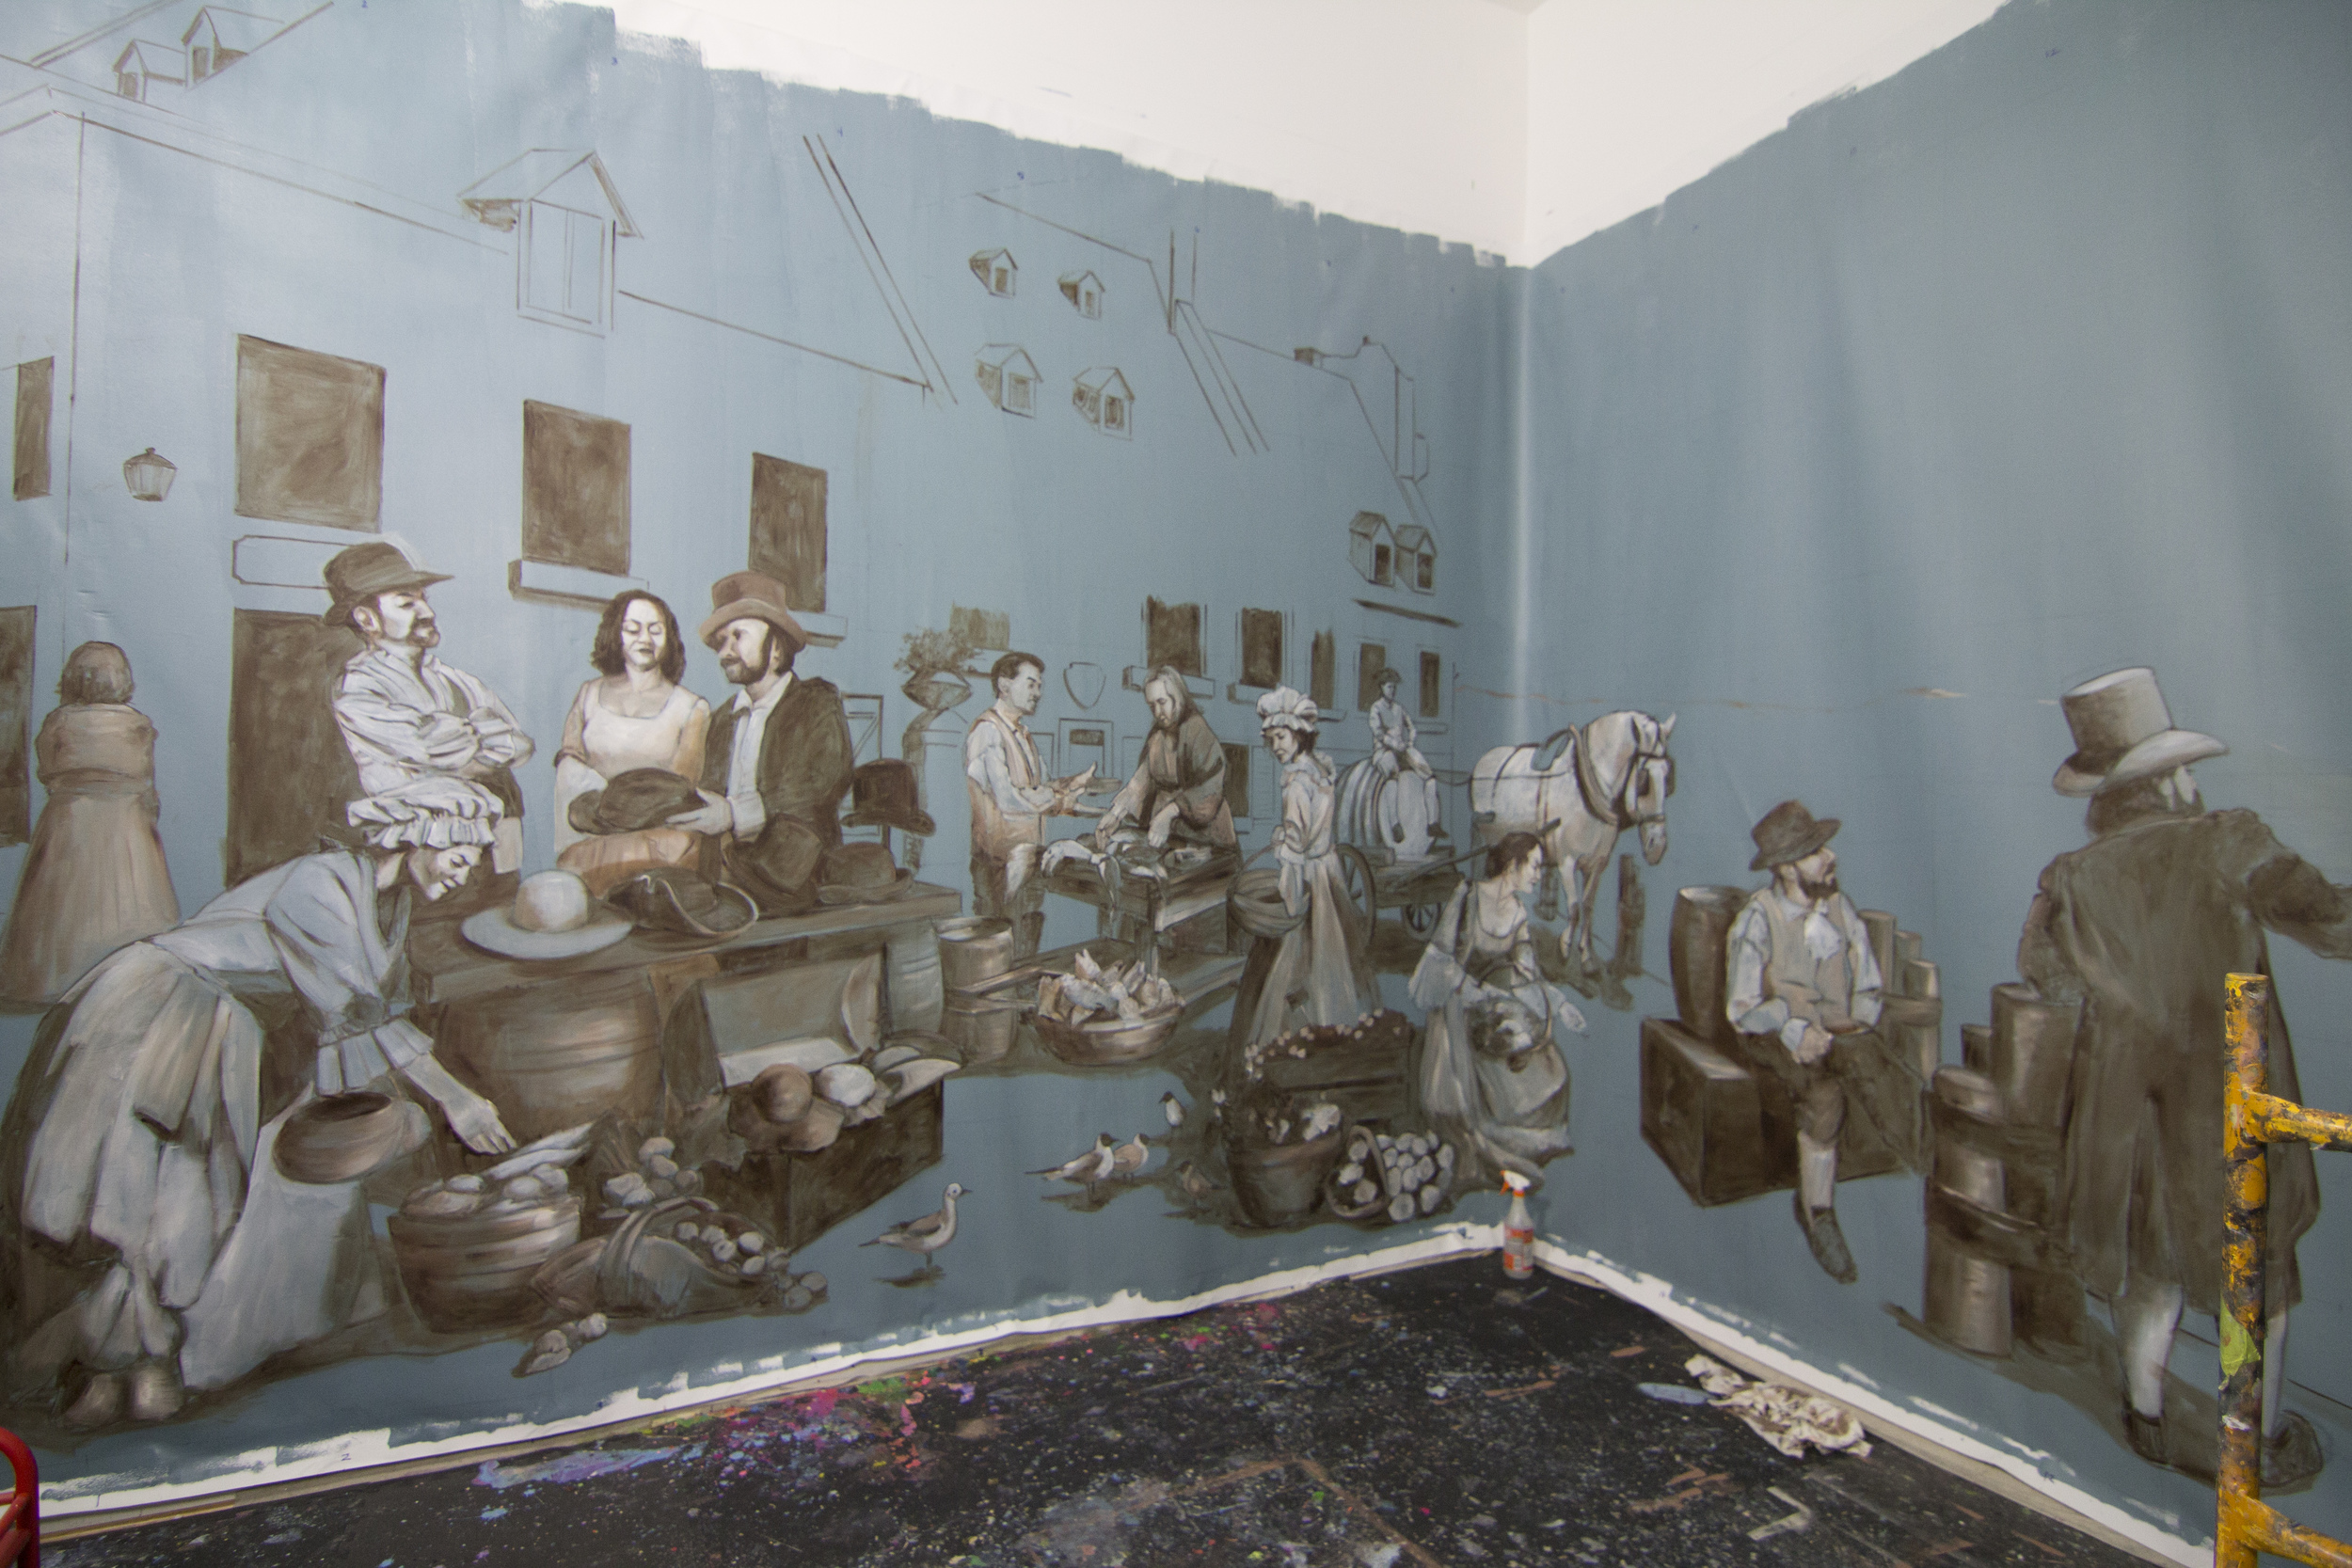 Mural in progress in Los Angeles studio